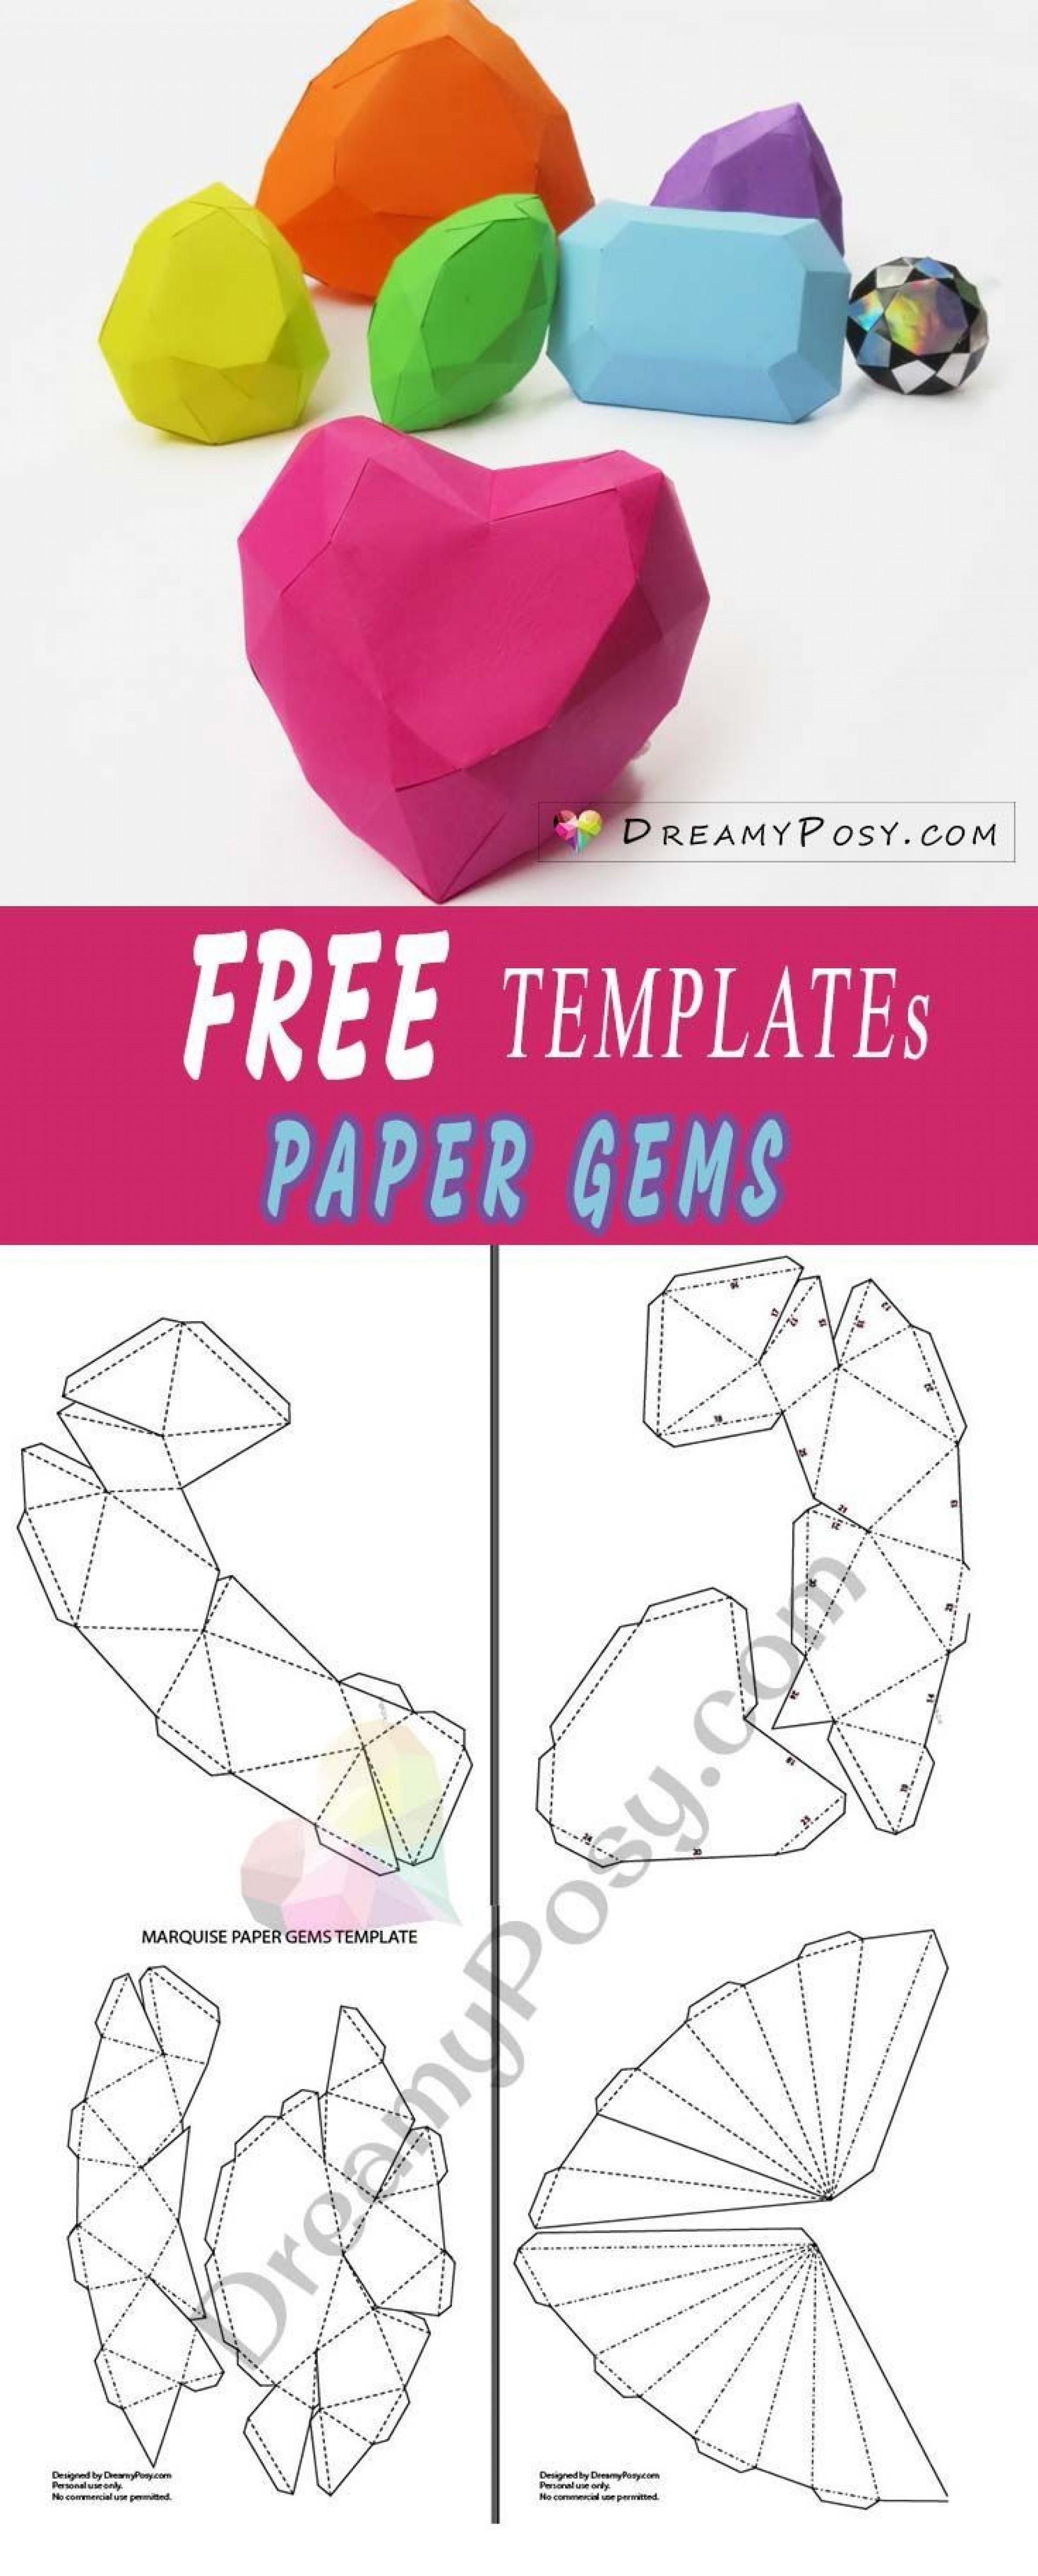 003 Magnificent 3d Paper Art Template Inspiration  Templates Pdf1920